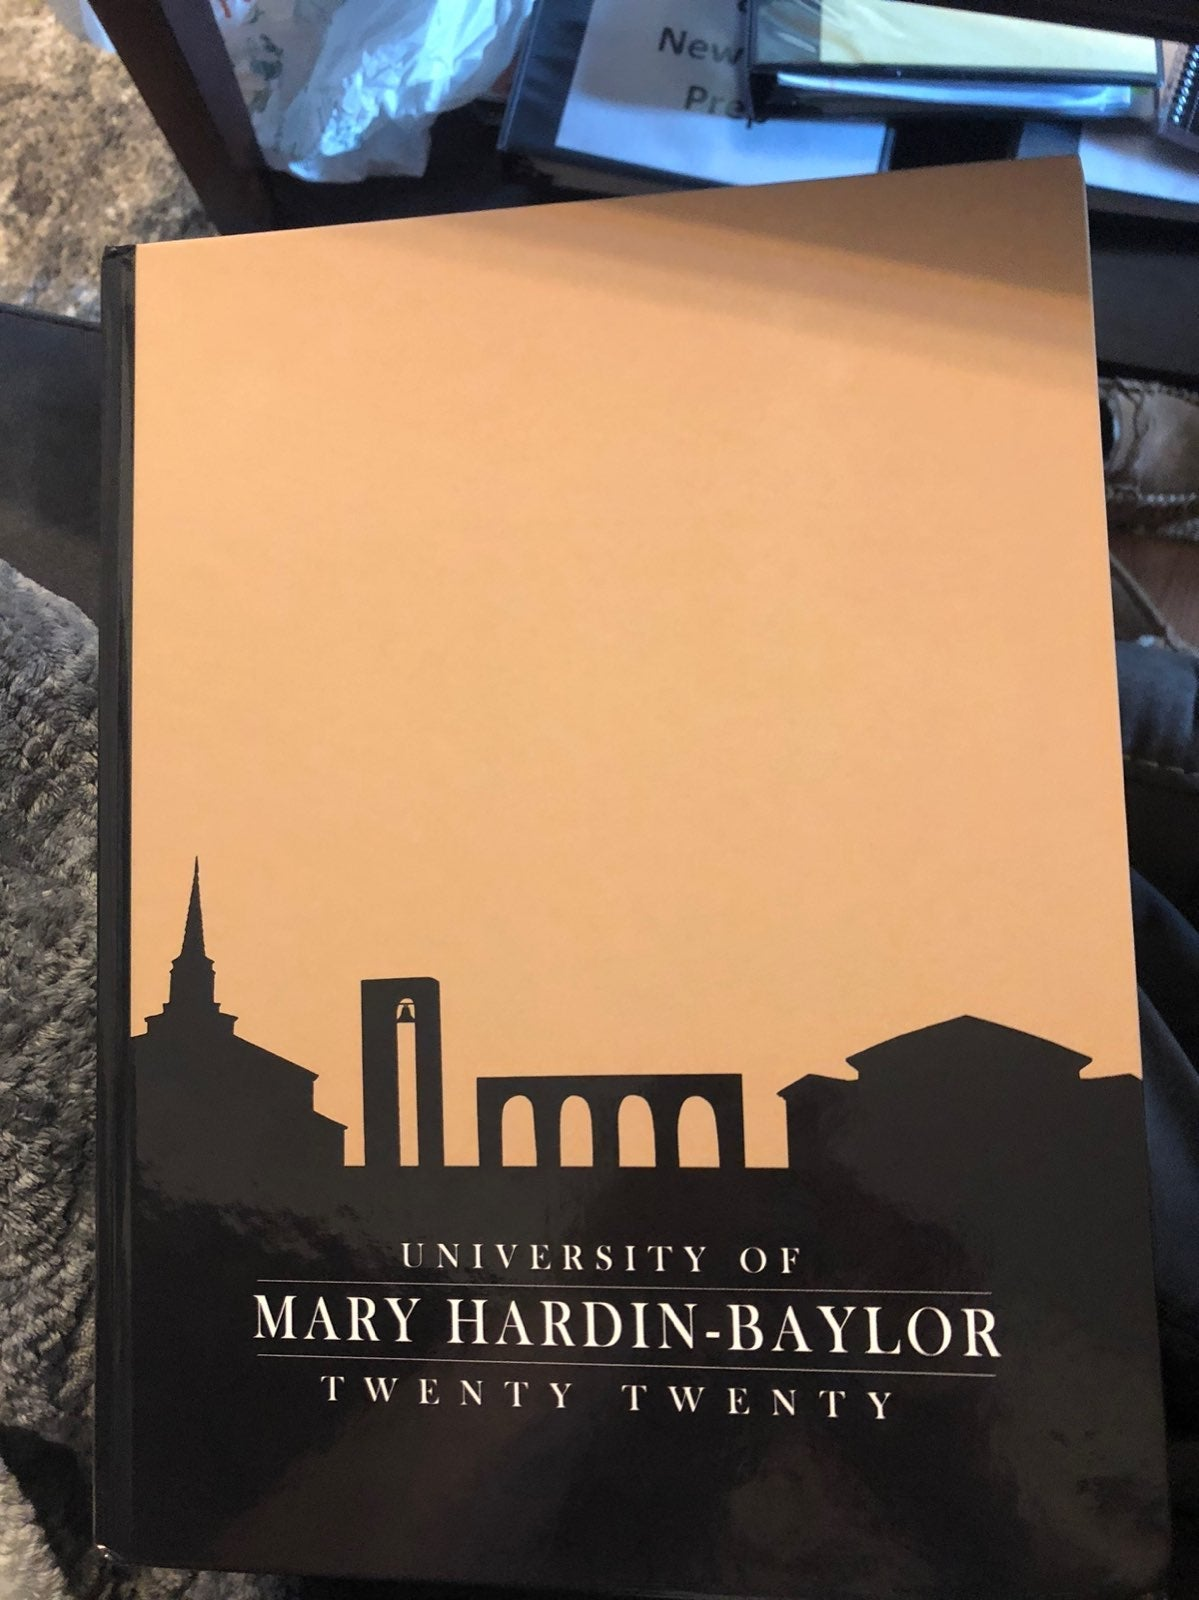 UMHB 2020 yearbook Mary Hardin Baylor